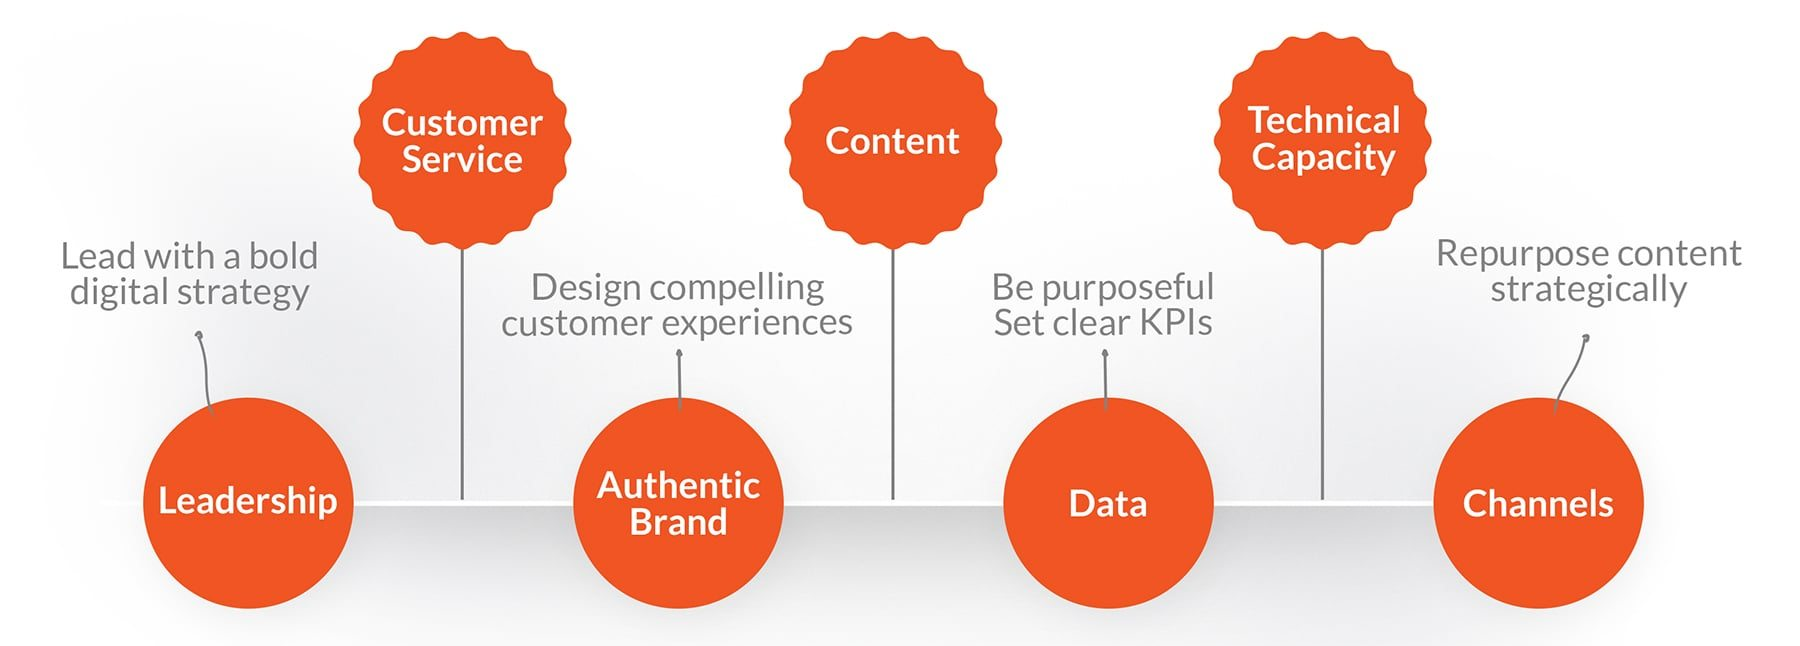 The Mettro Digital Blueprint